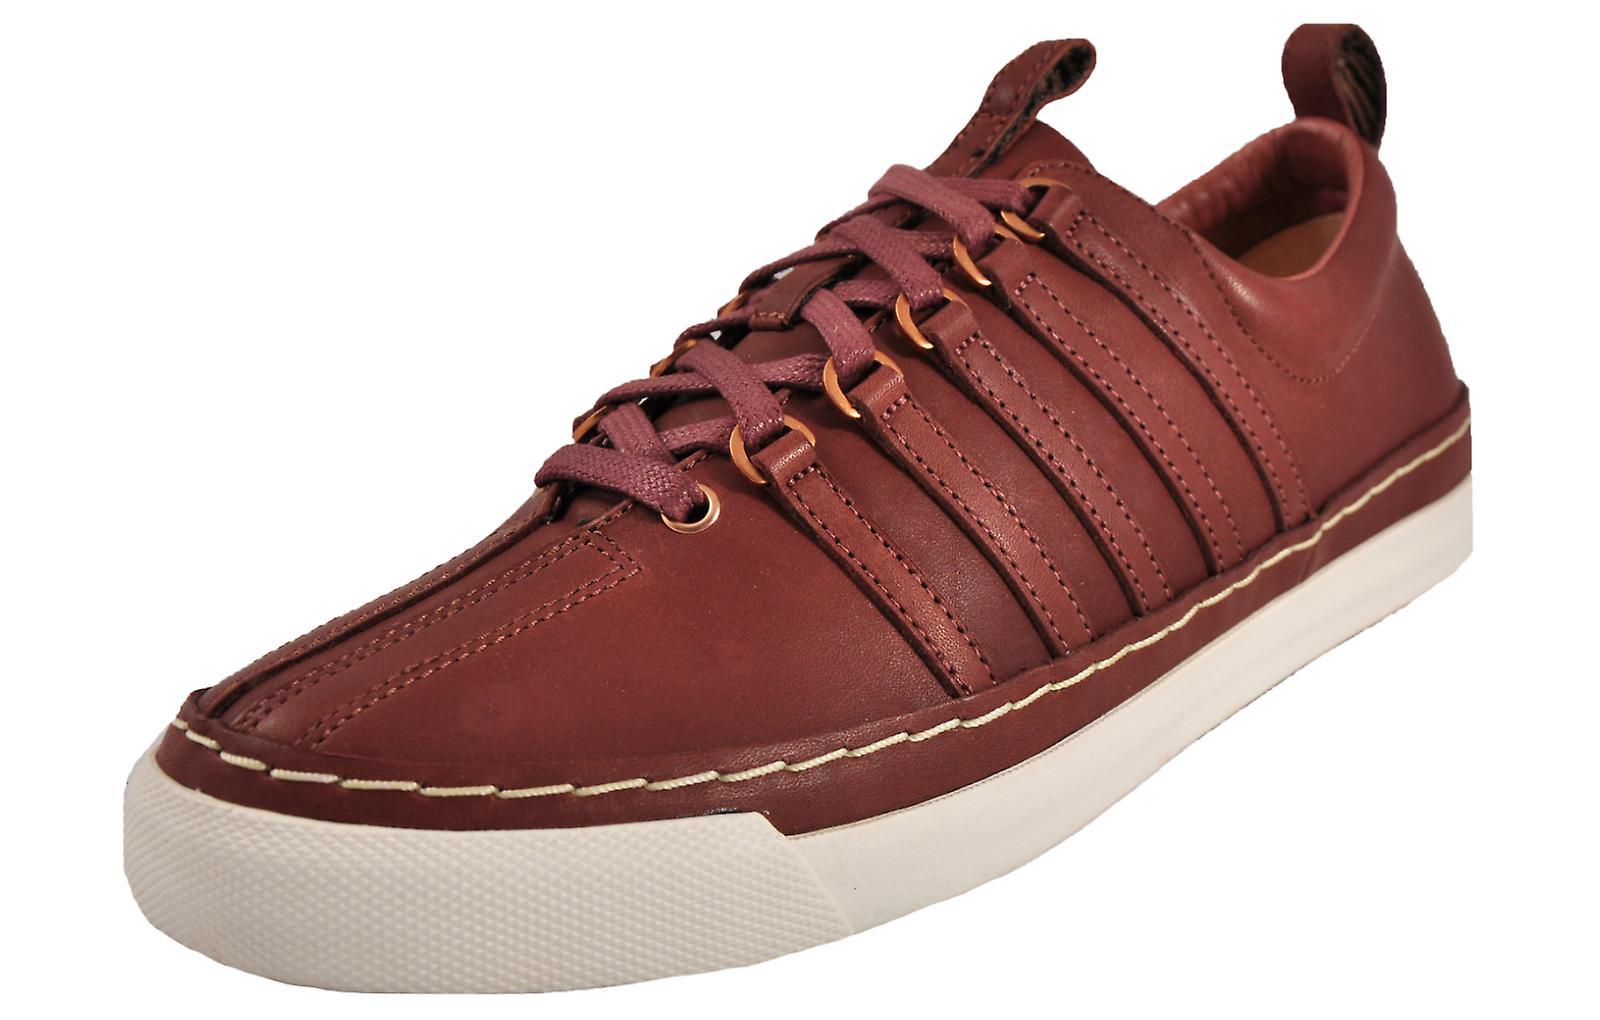 K Swiss X Billy Reid Arlington VT Leather Ltd Edition Cinnamon / Whisper White